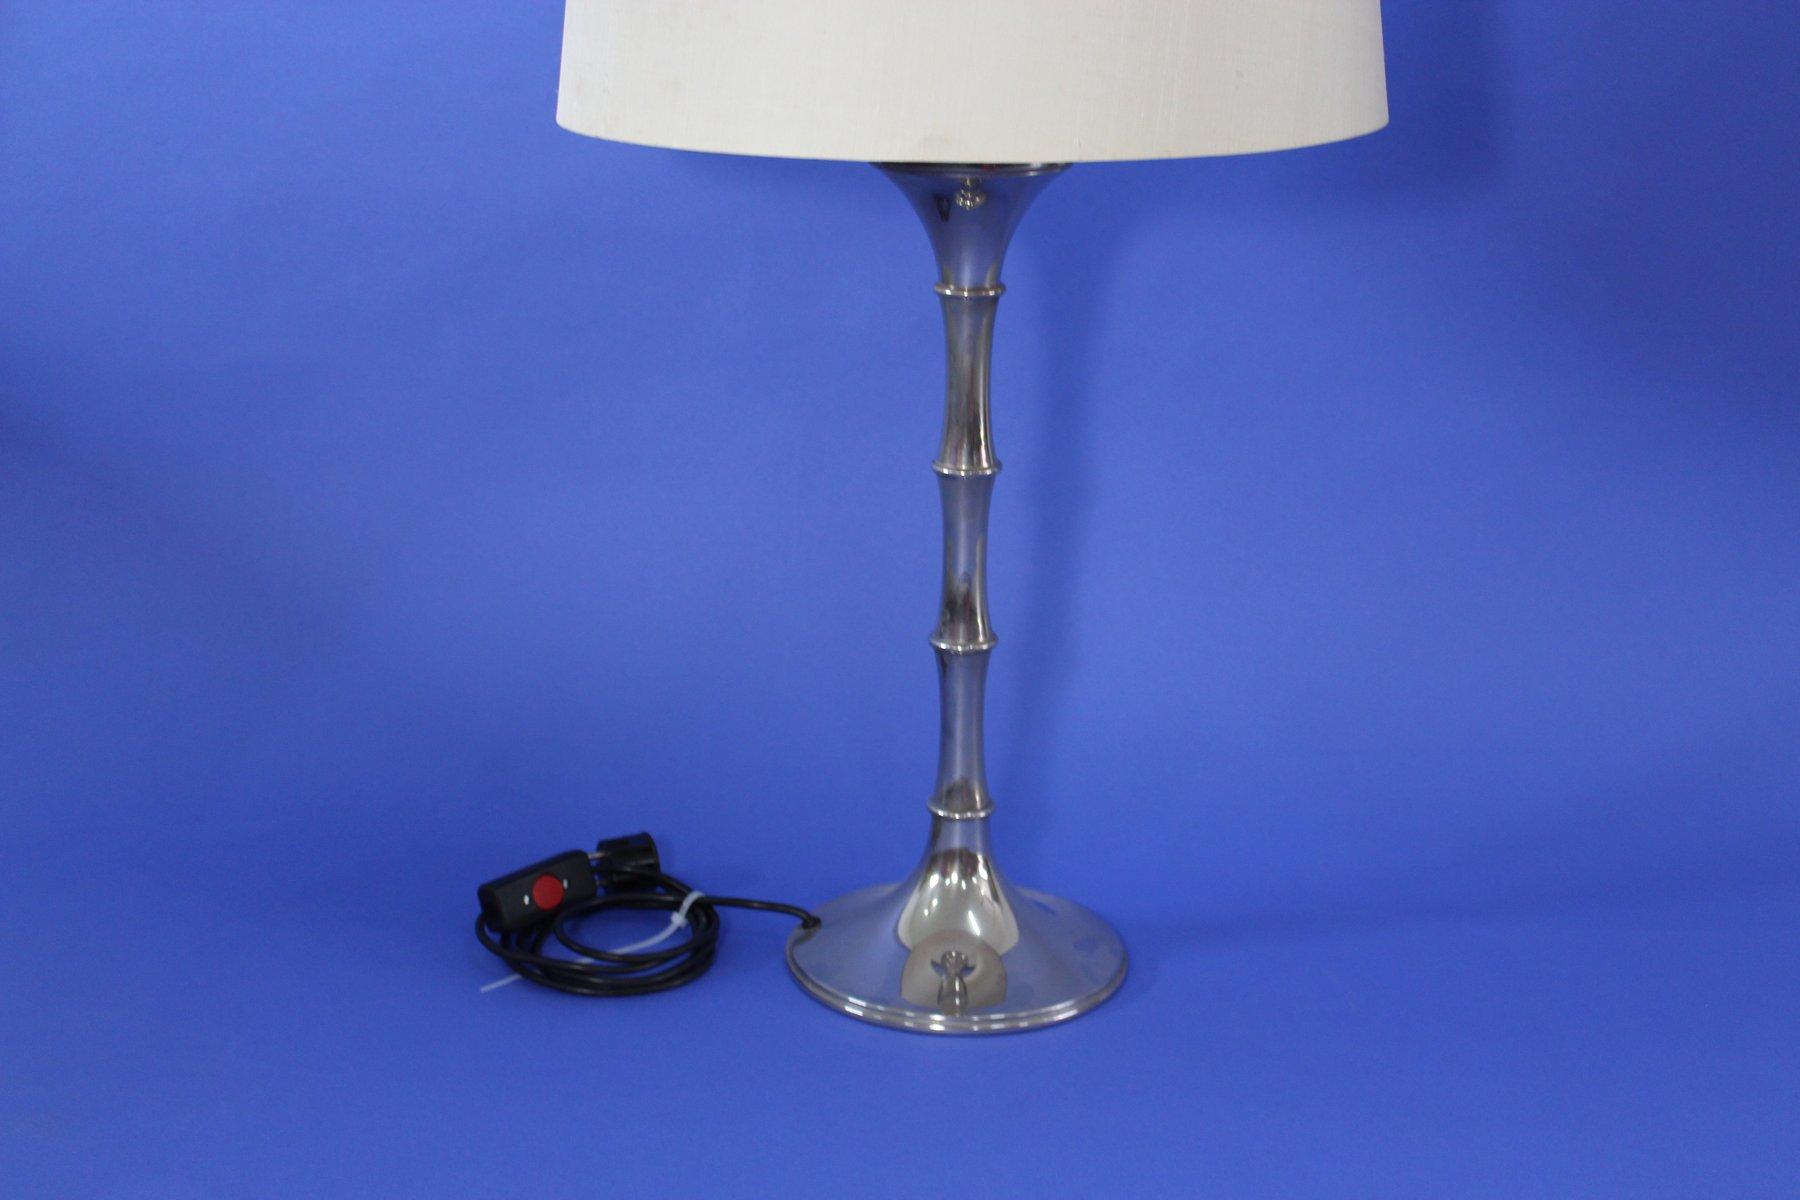 Vintage Bamboo Table Lamp By Ingo Maurer For Design M